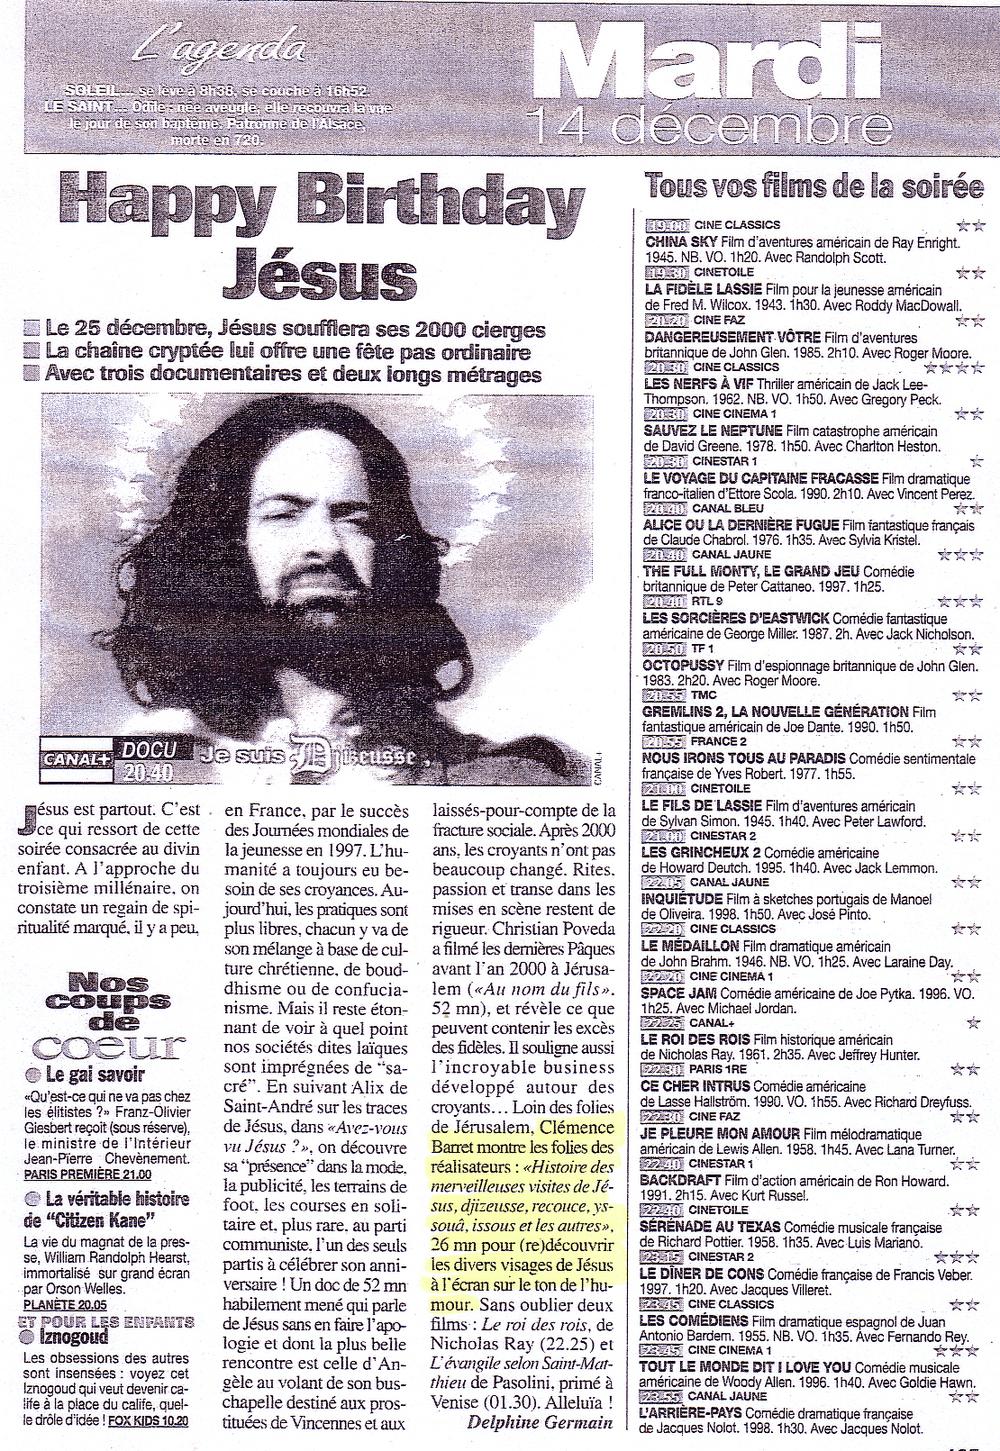 press-1998-2000-3-011